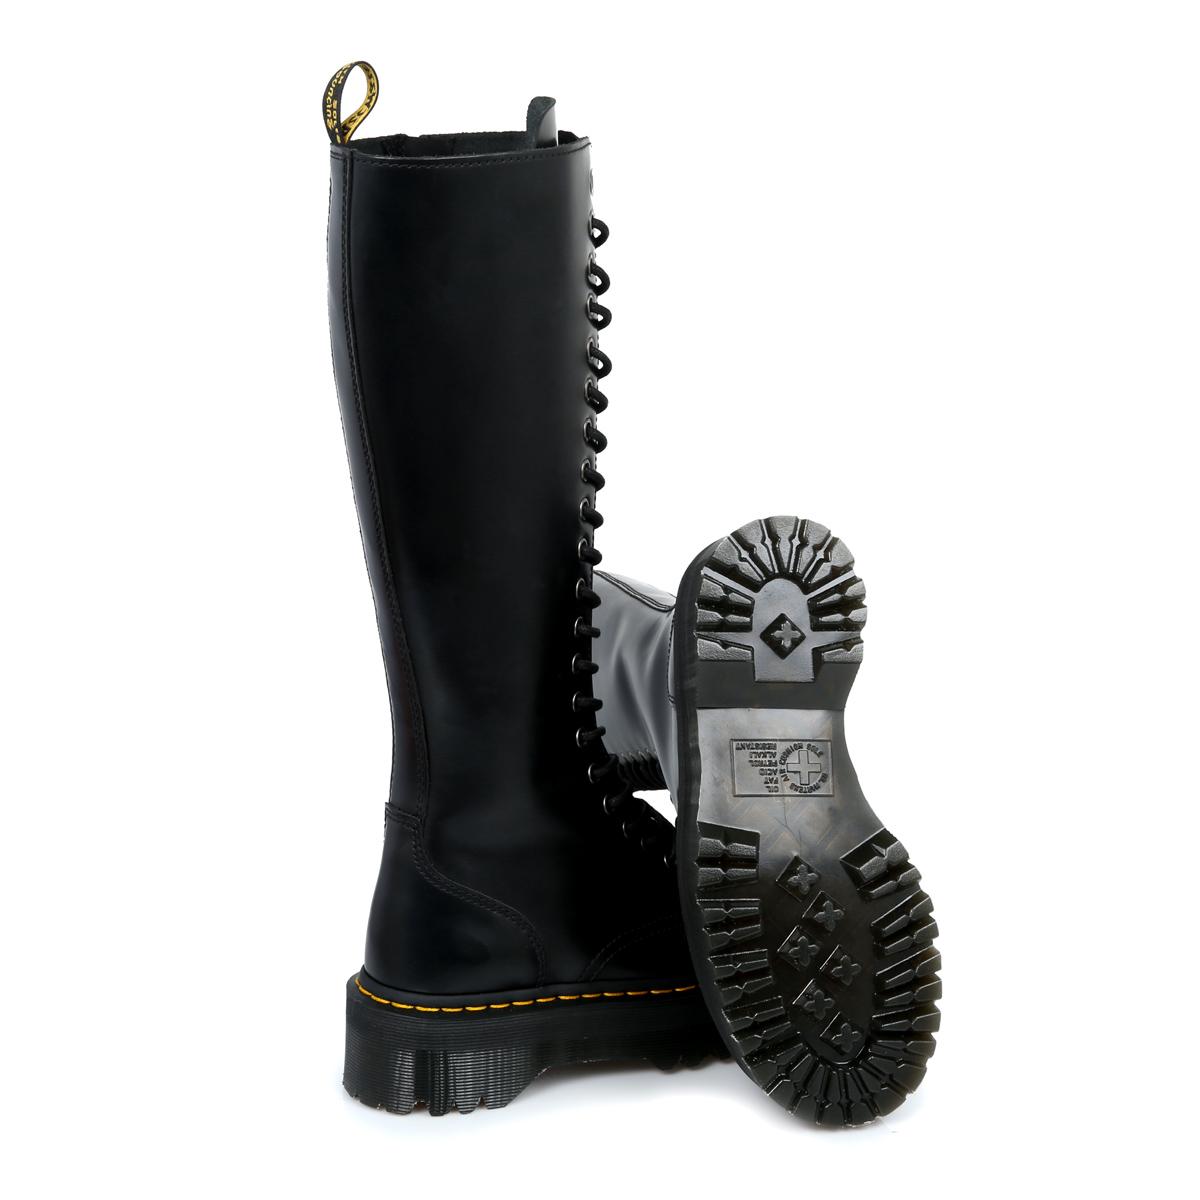 Dr Martens Britain Leather Women Boots sizes 3-8 | eBay